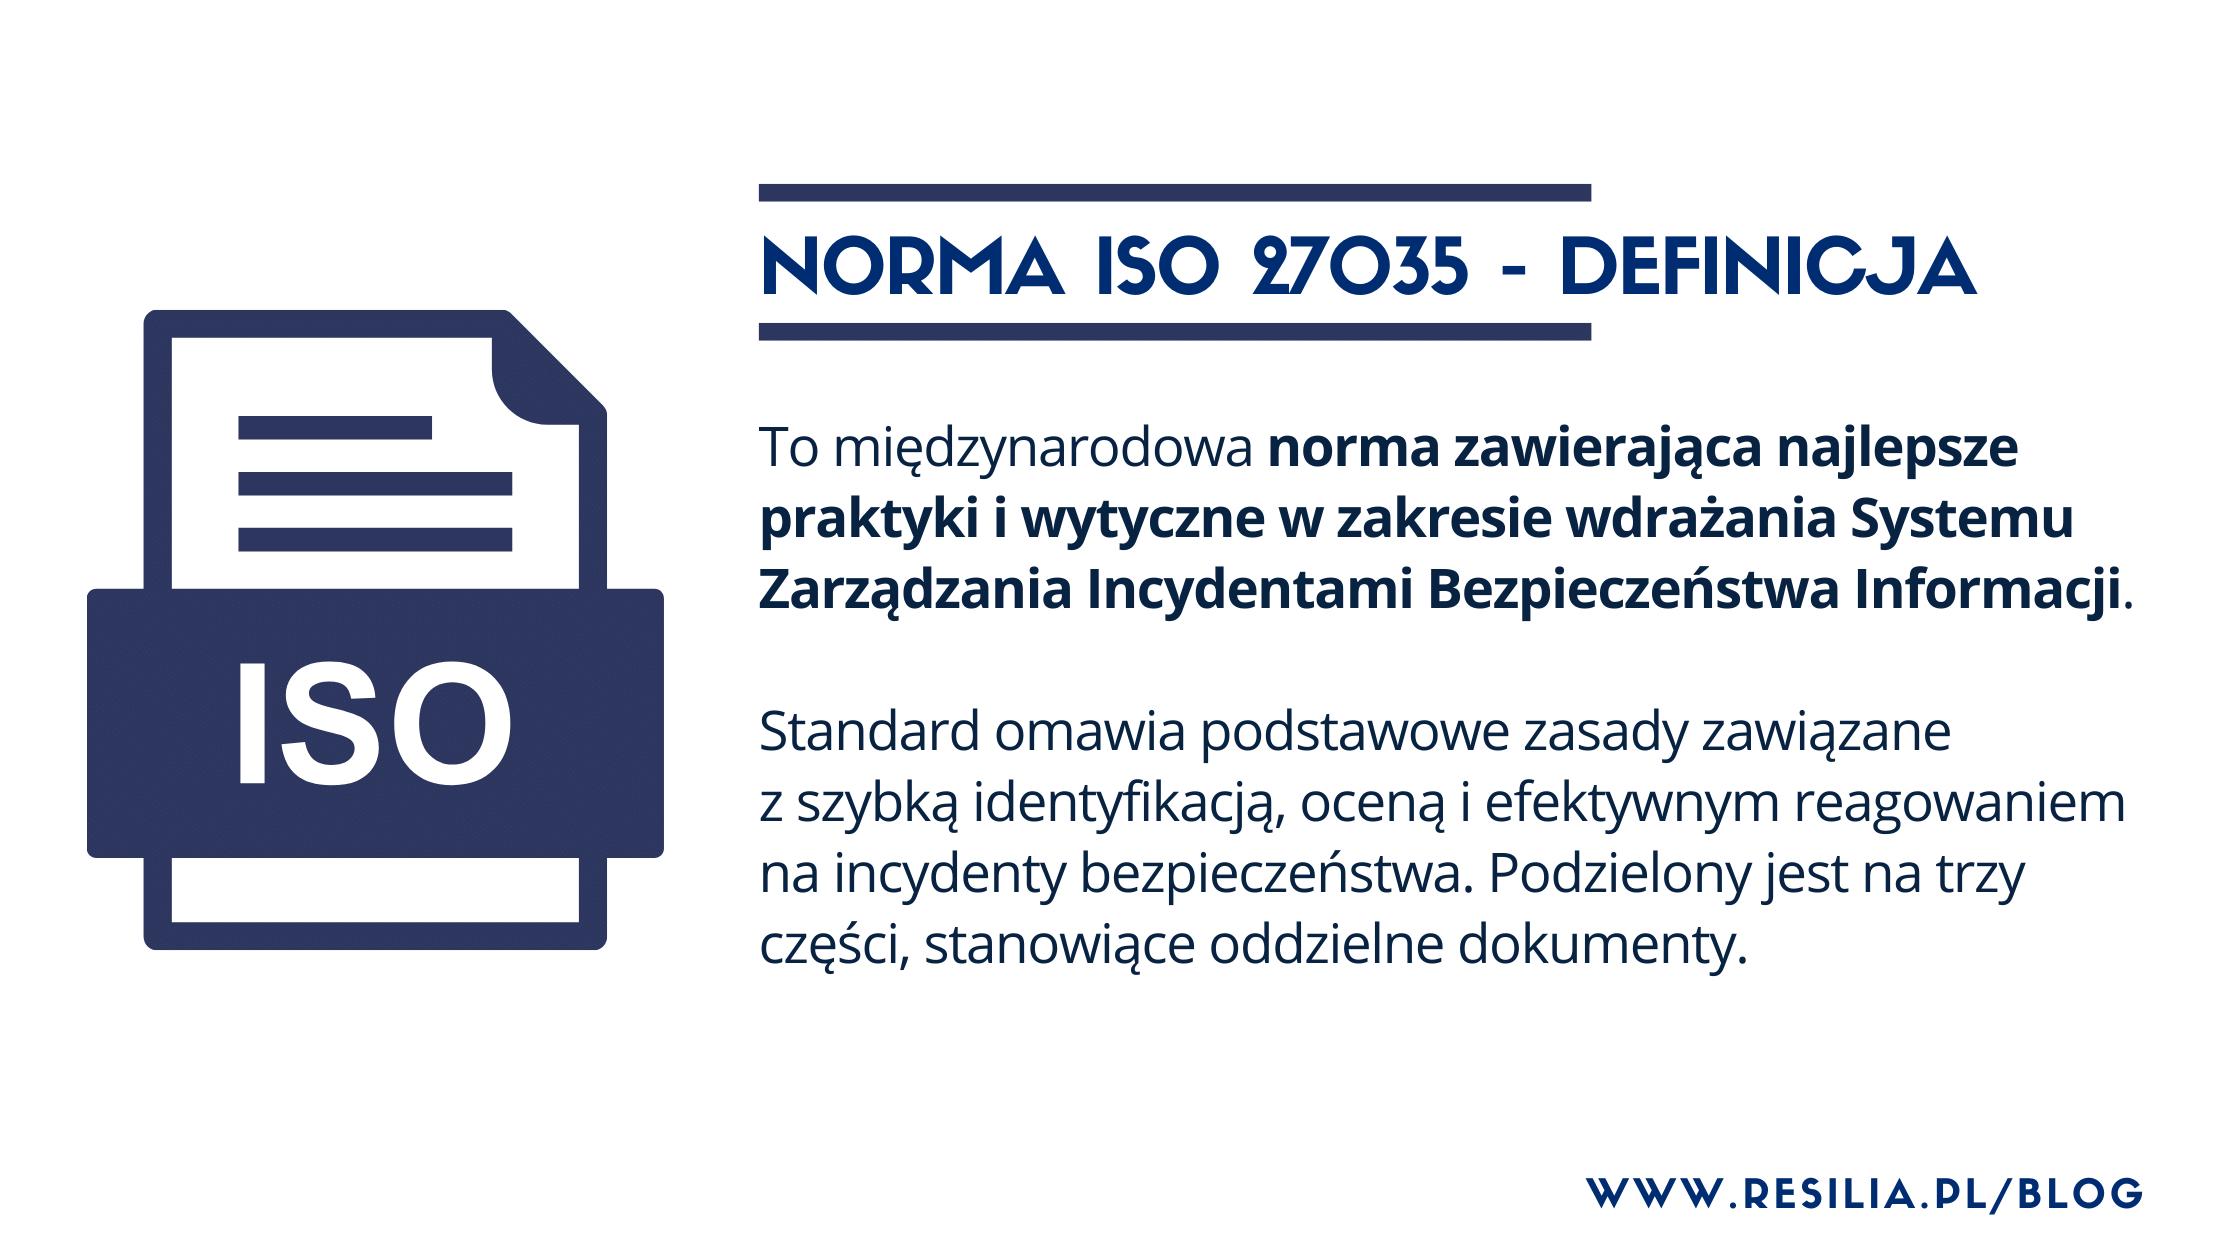 ISO 27035 definicja